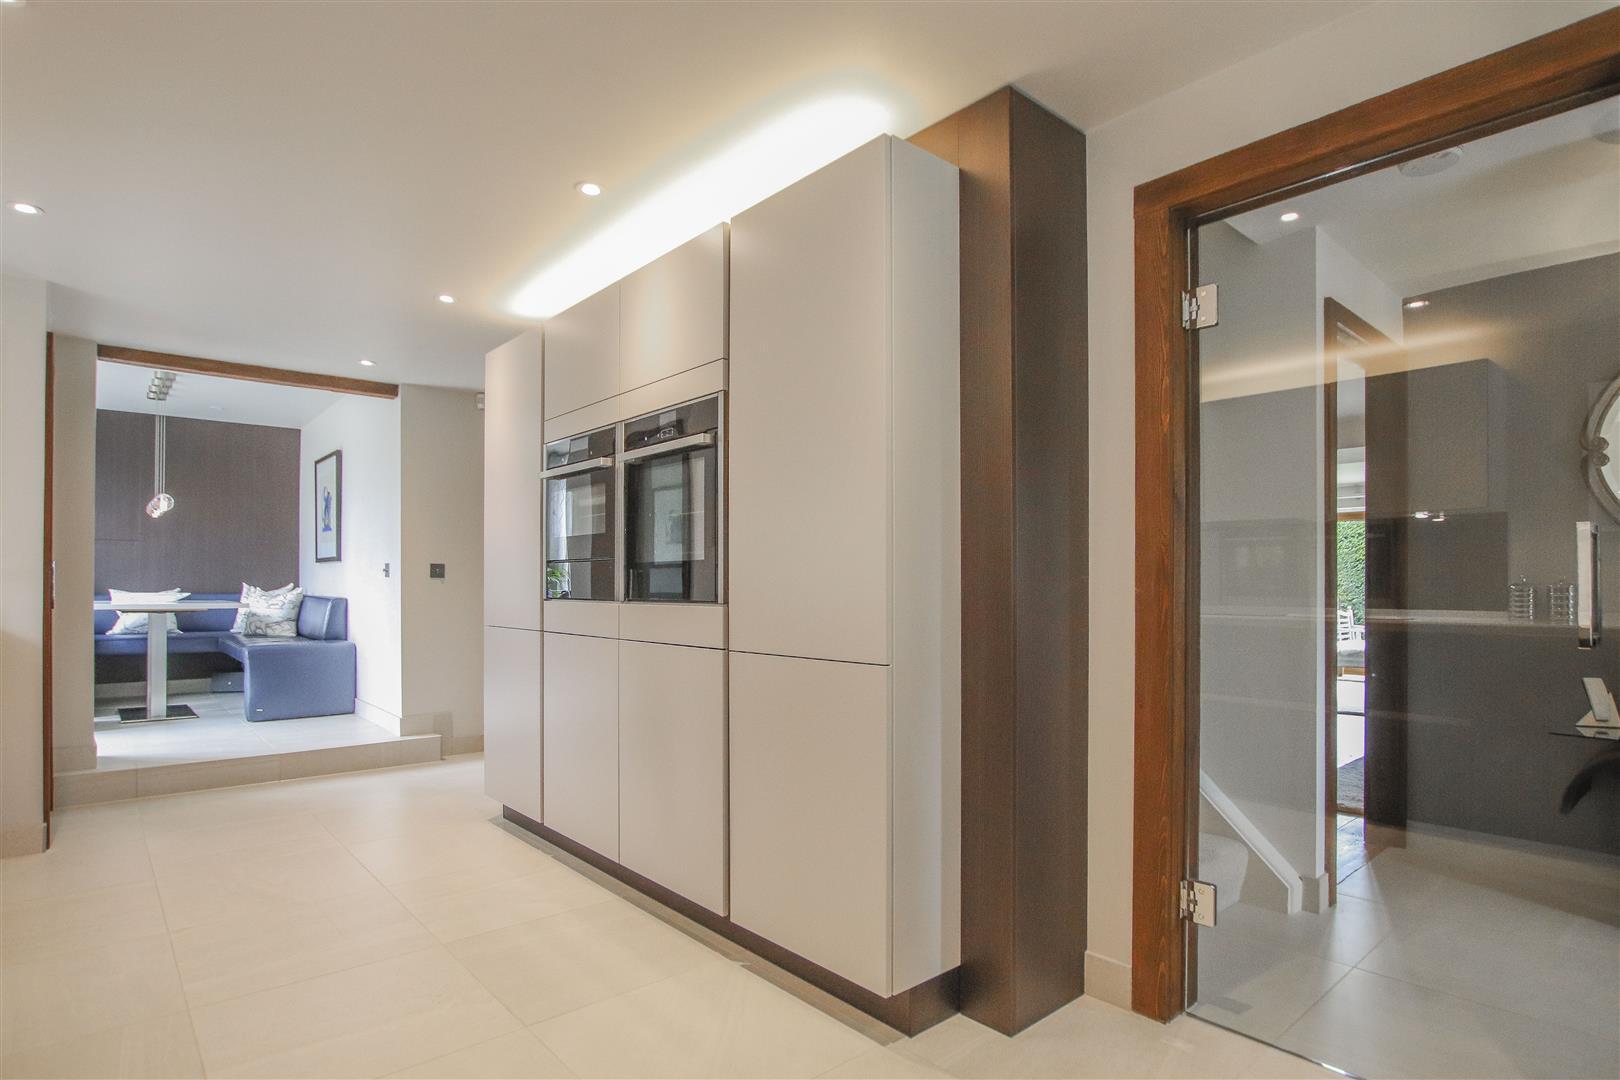 5 Bedroom Semi-detached House For Sale - 10.JPG